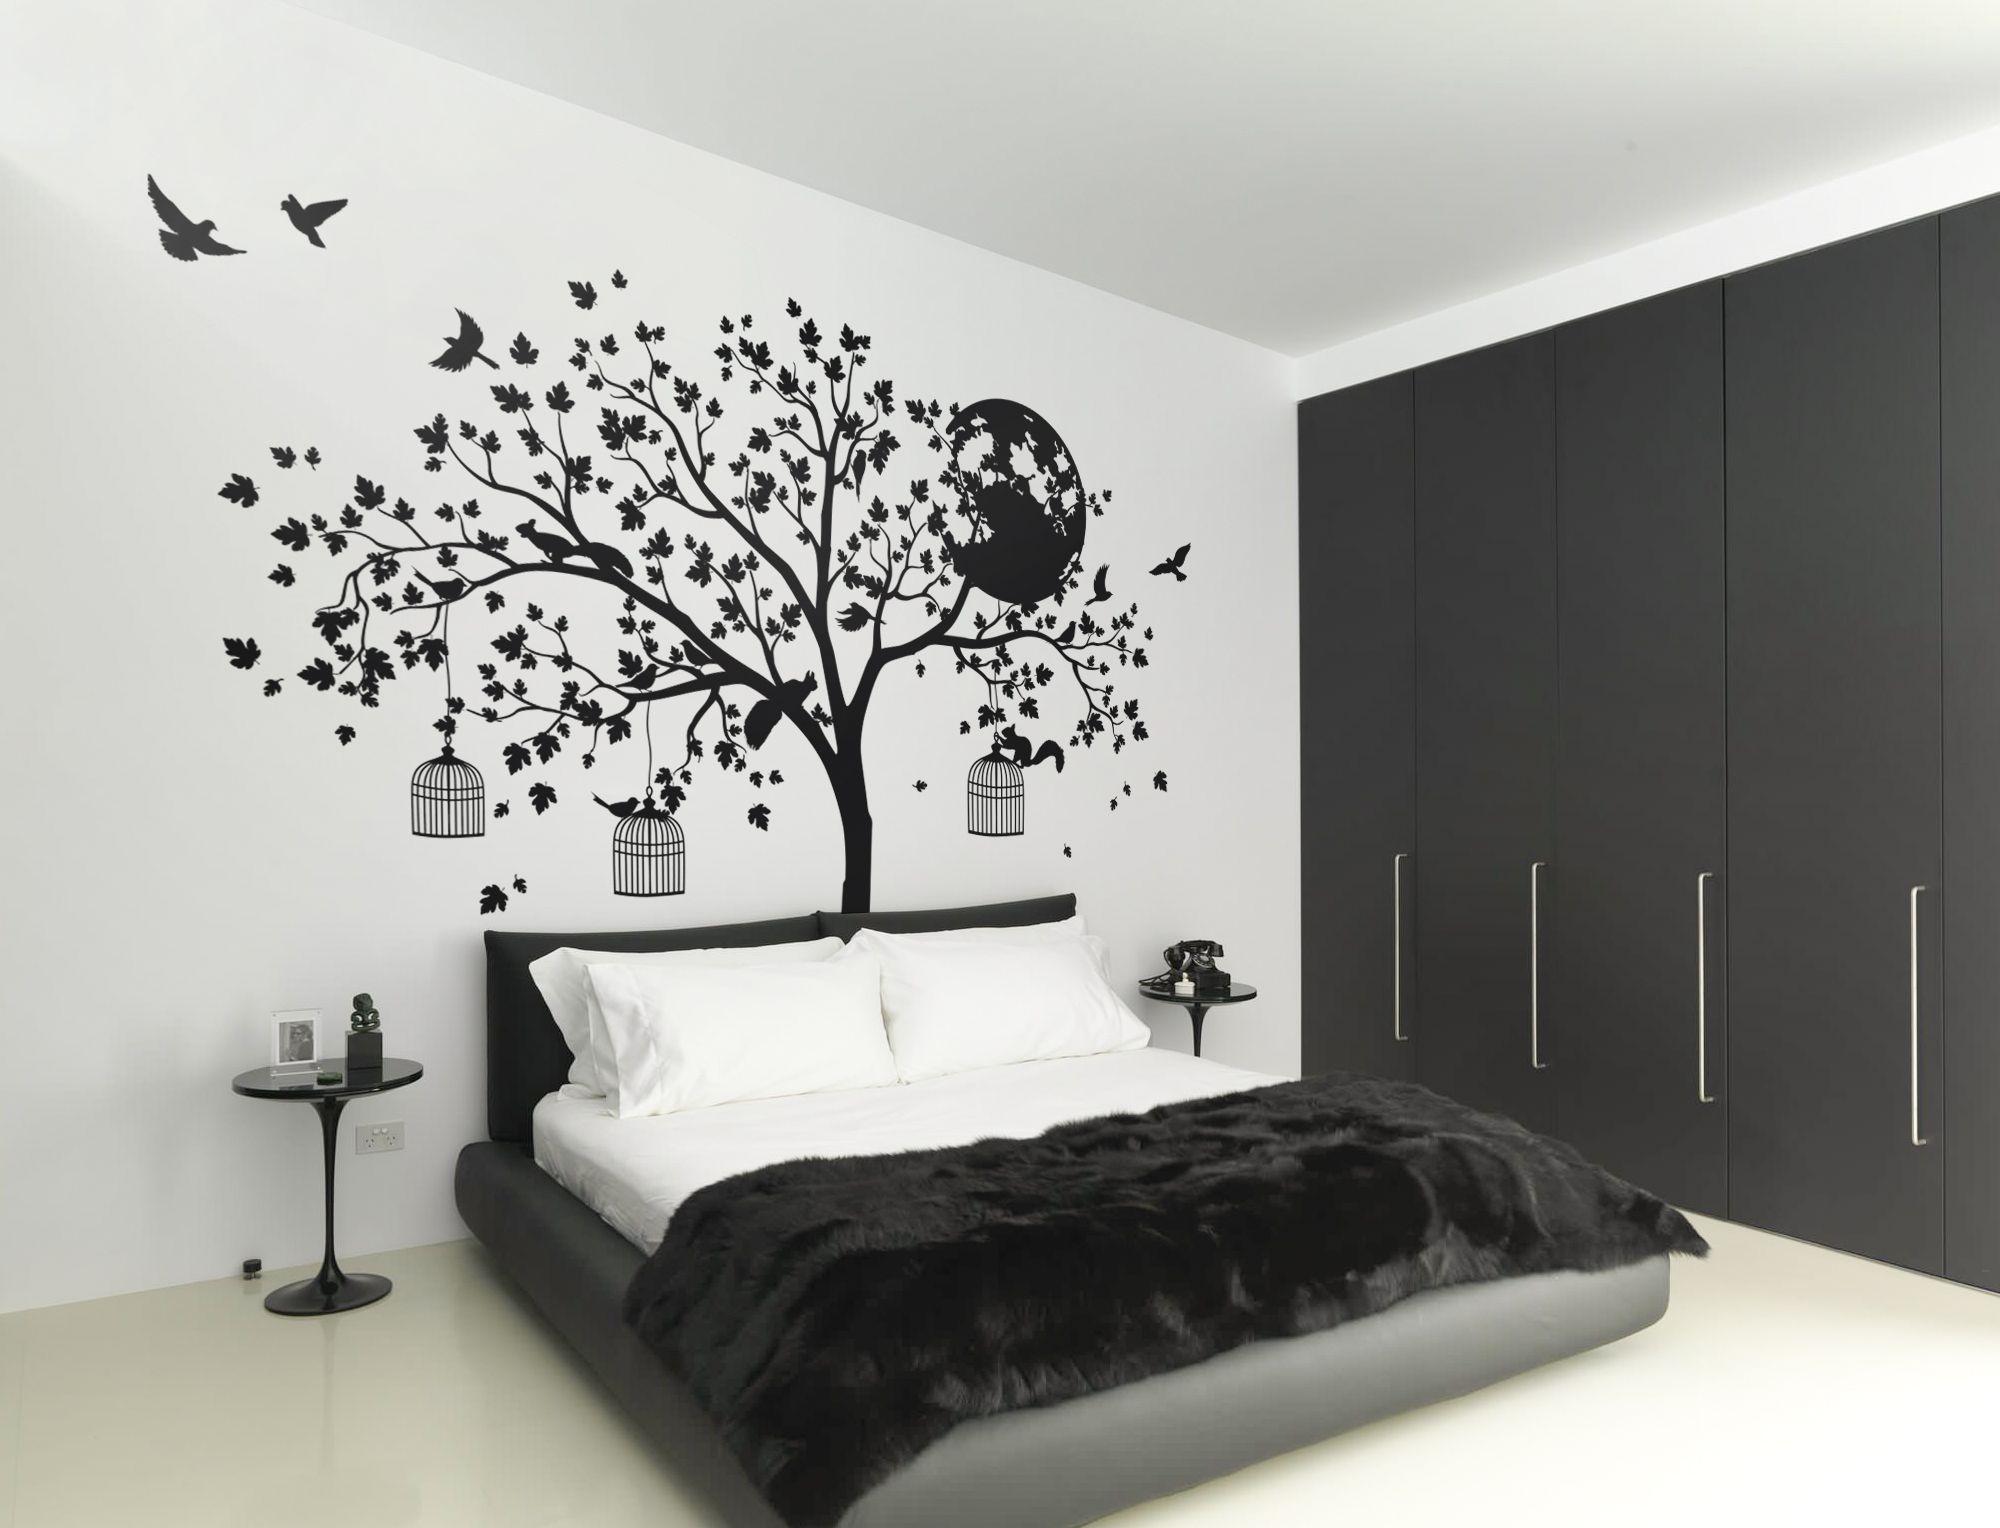 flying birds childs bedroom wall ceiling  Wall Sticker Art Vinyl Decal